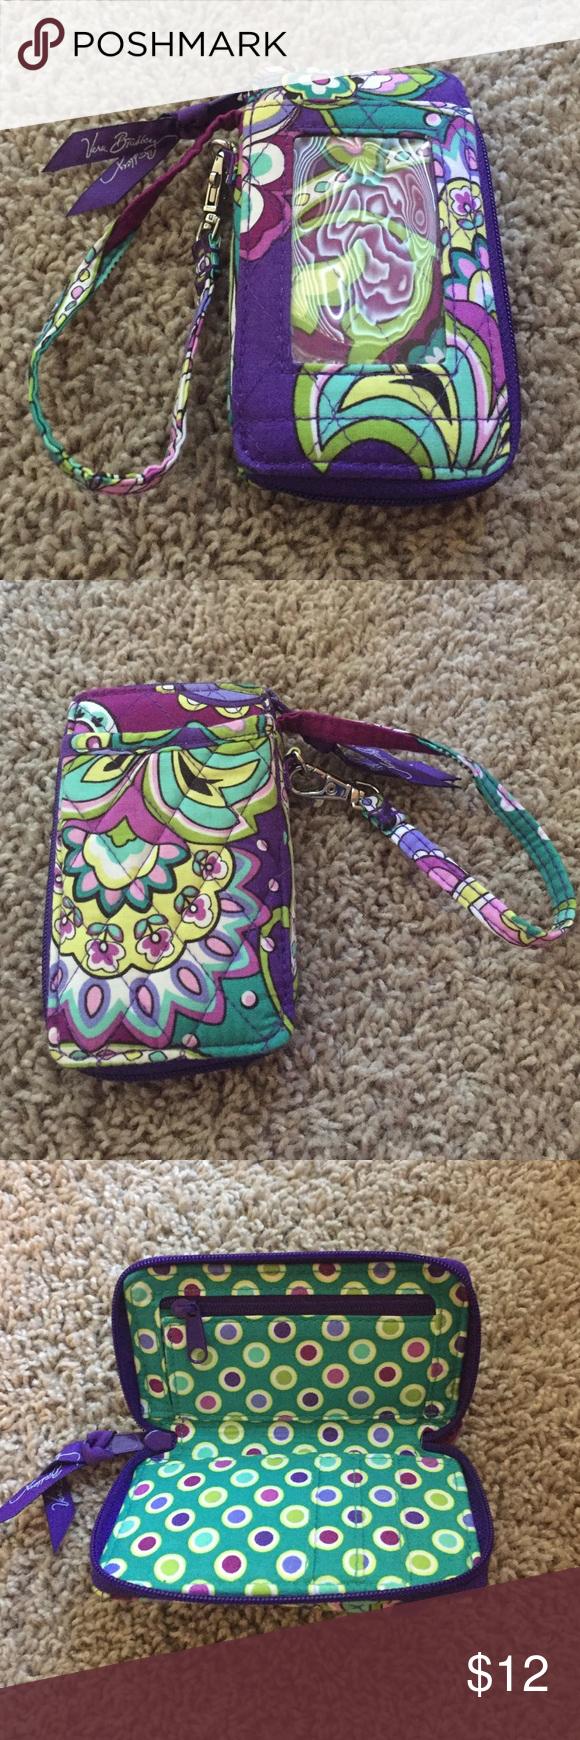 Vera Bradley Purple Wallet Never Been Used Vera Bradley Wallet Has